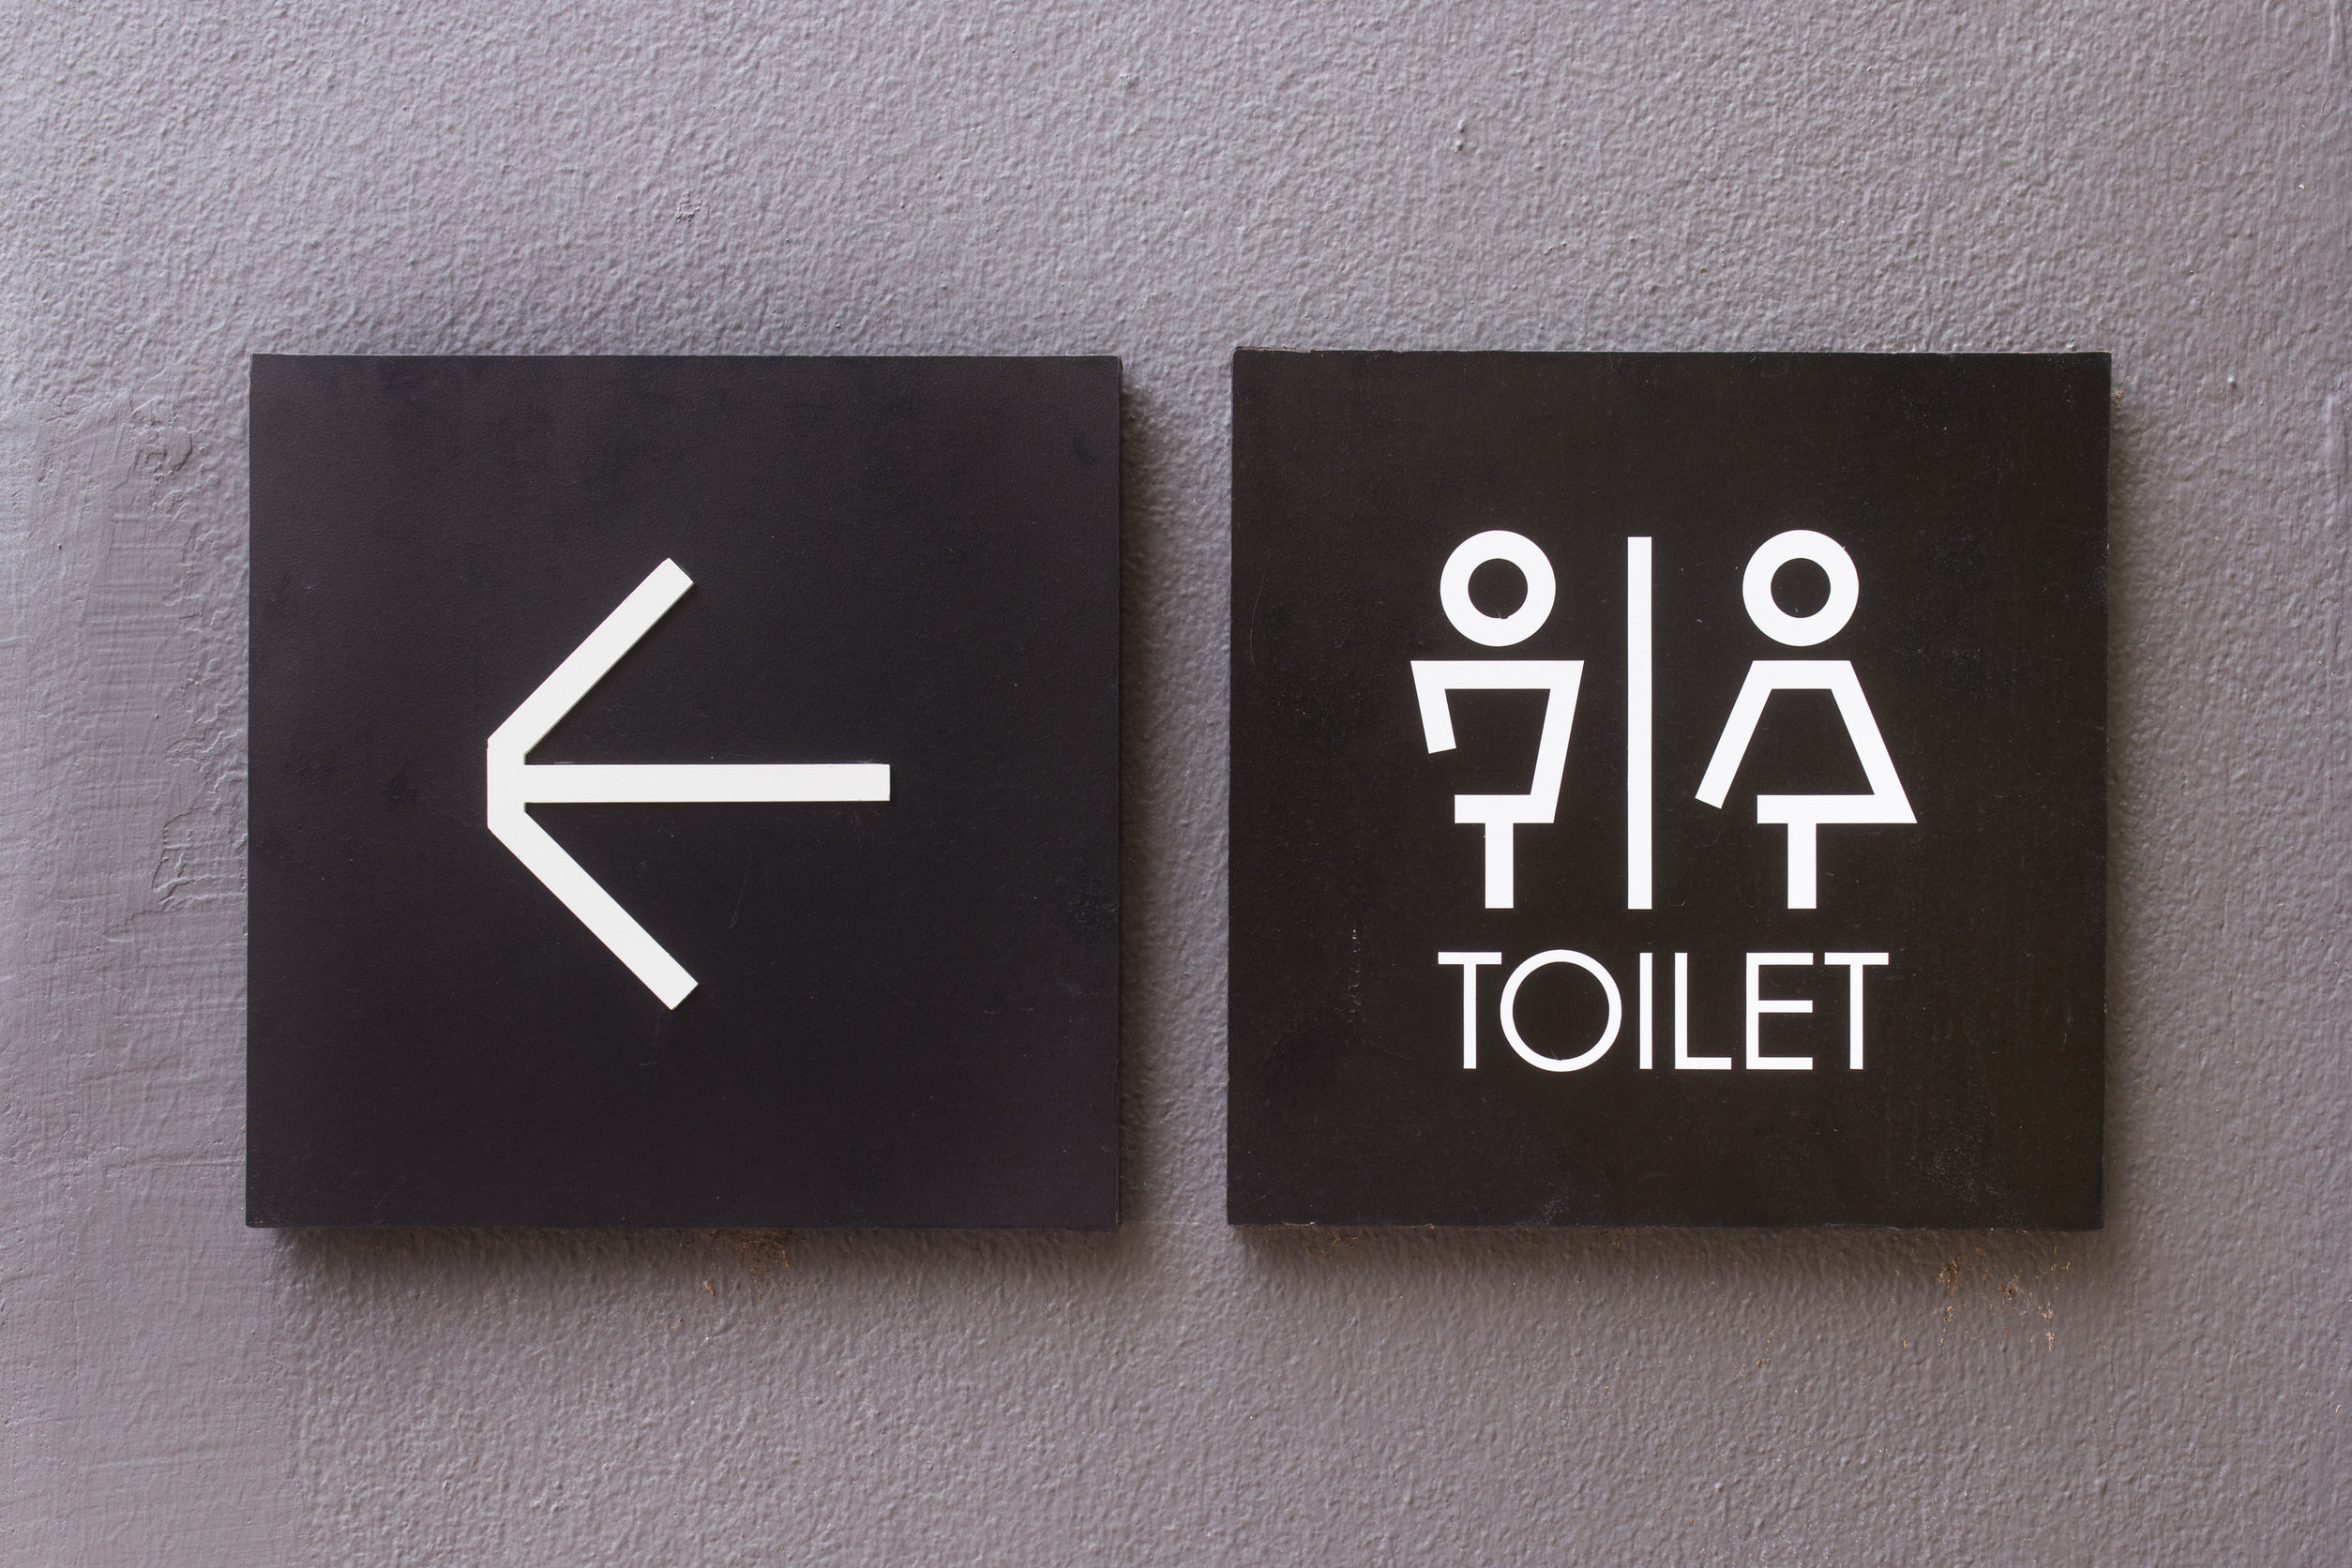 https://www.studiocataldi.it/images/imgnews/originali/toilette_bagno_simbolo_uomo_donna-id25998.jpg